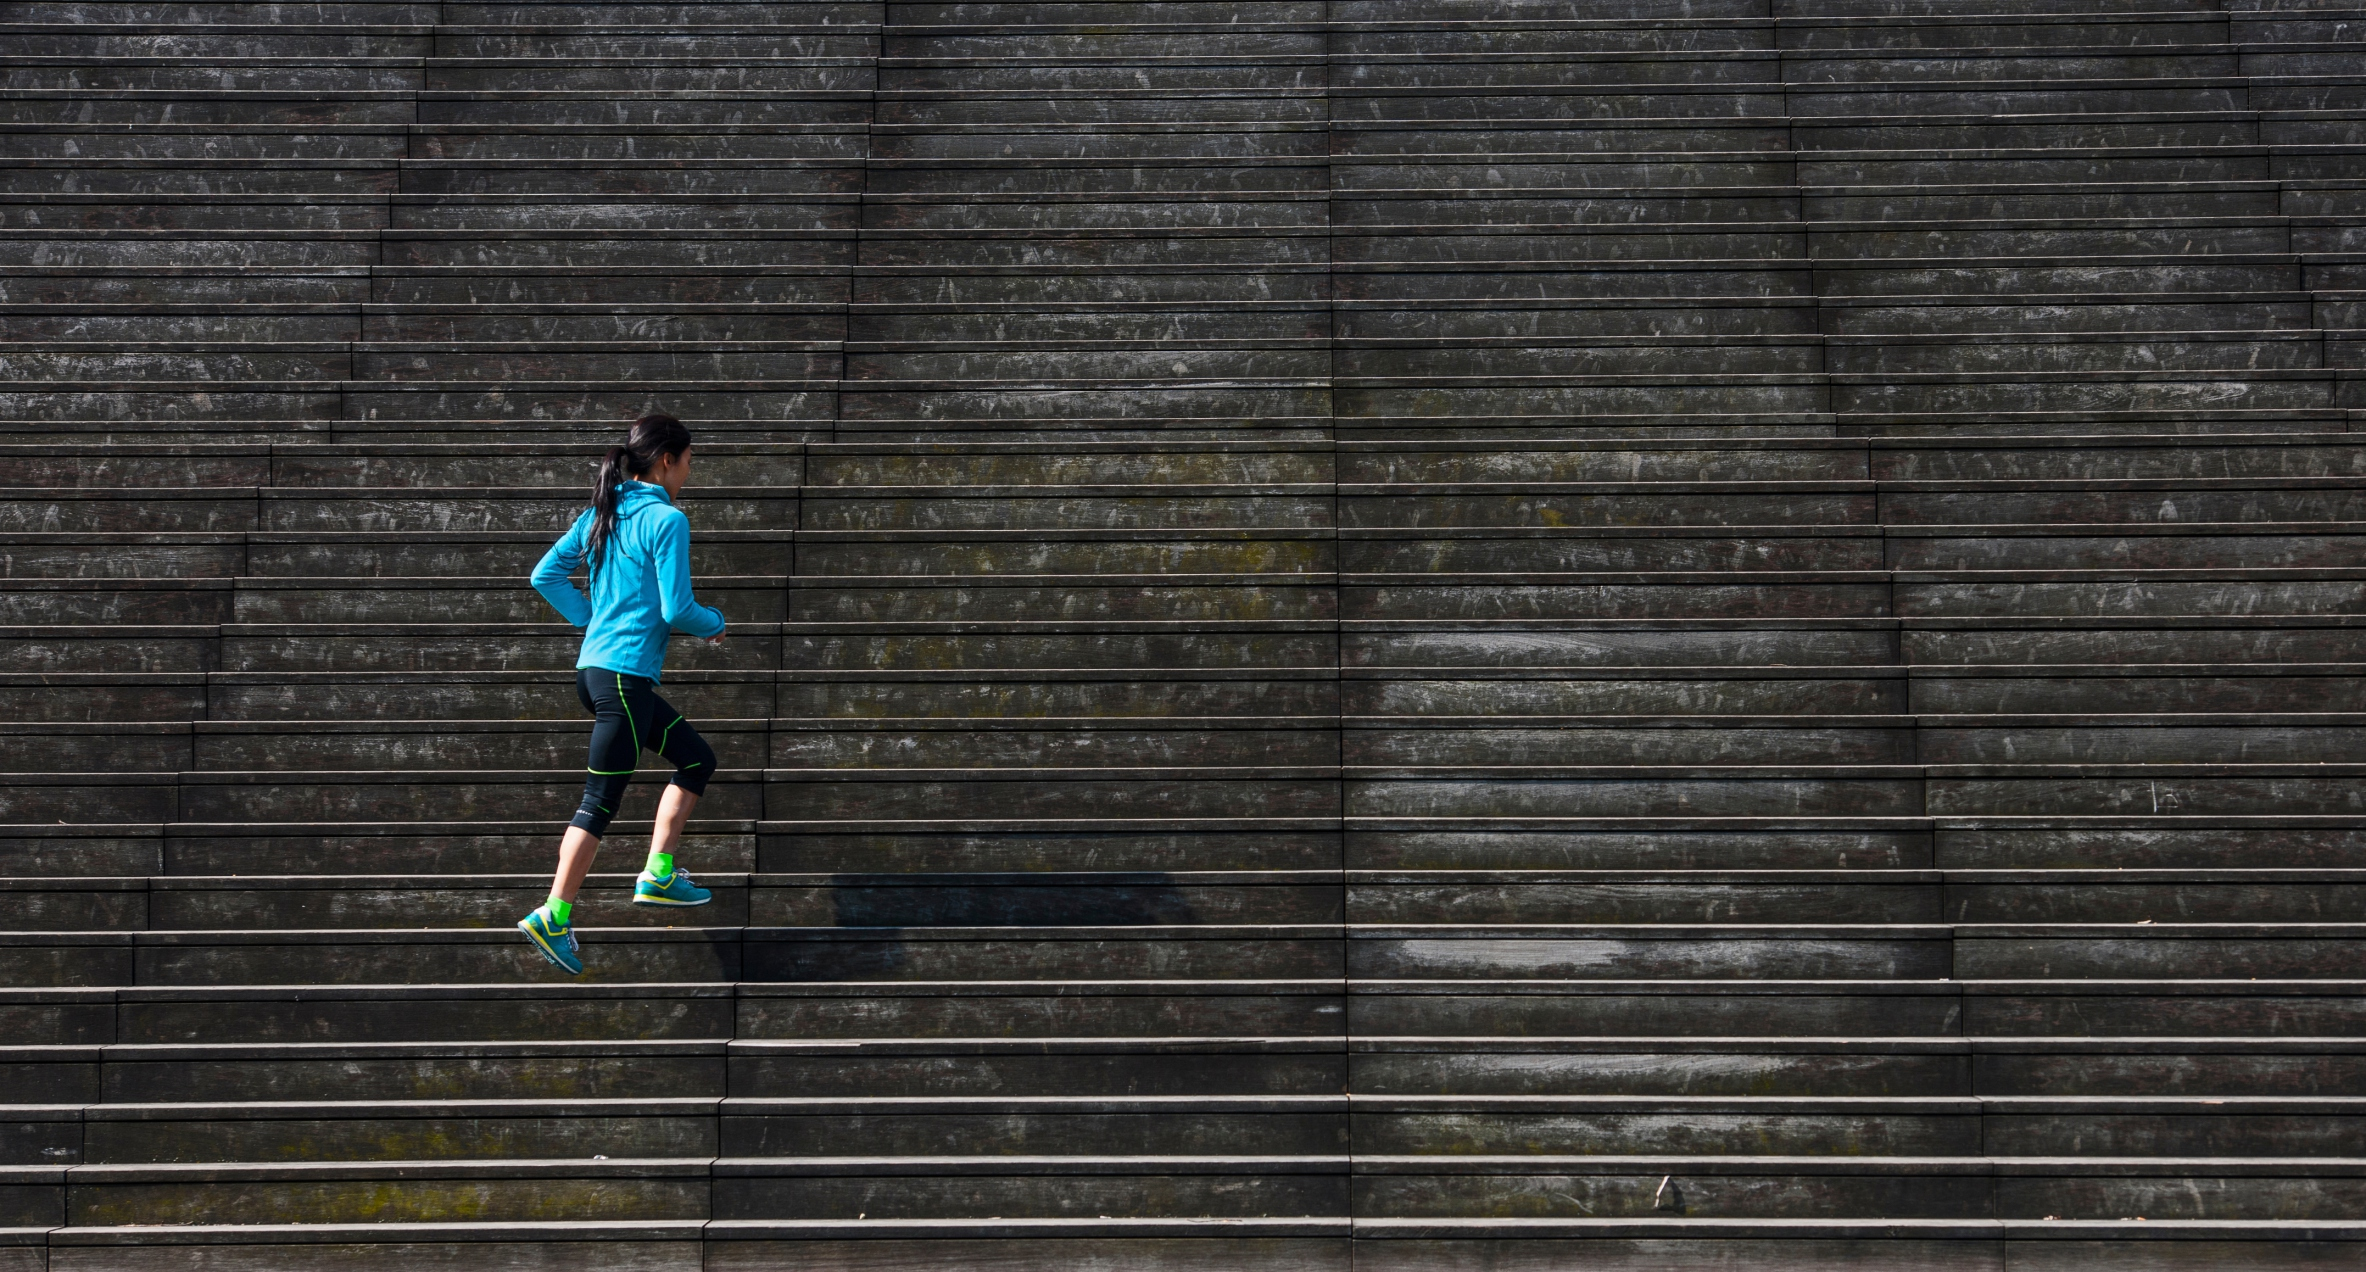 Exercise slashes risk of 13 types of cancer, says study